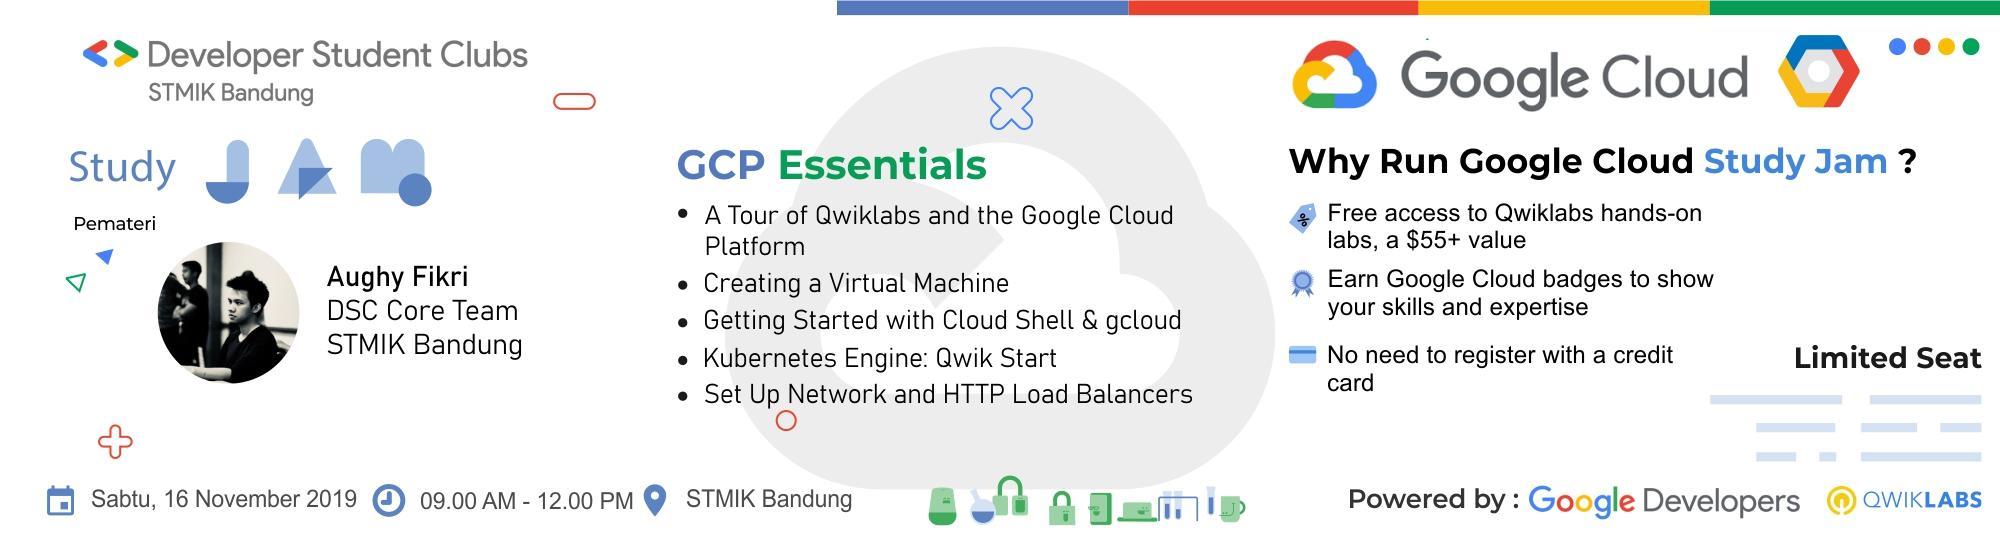 DSC Cloud Study Jam - GCP Essentials